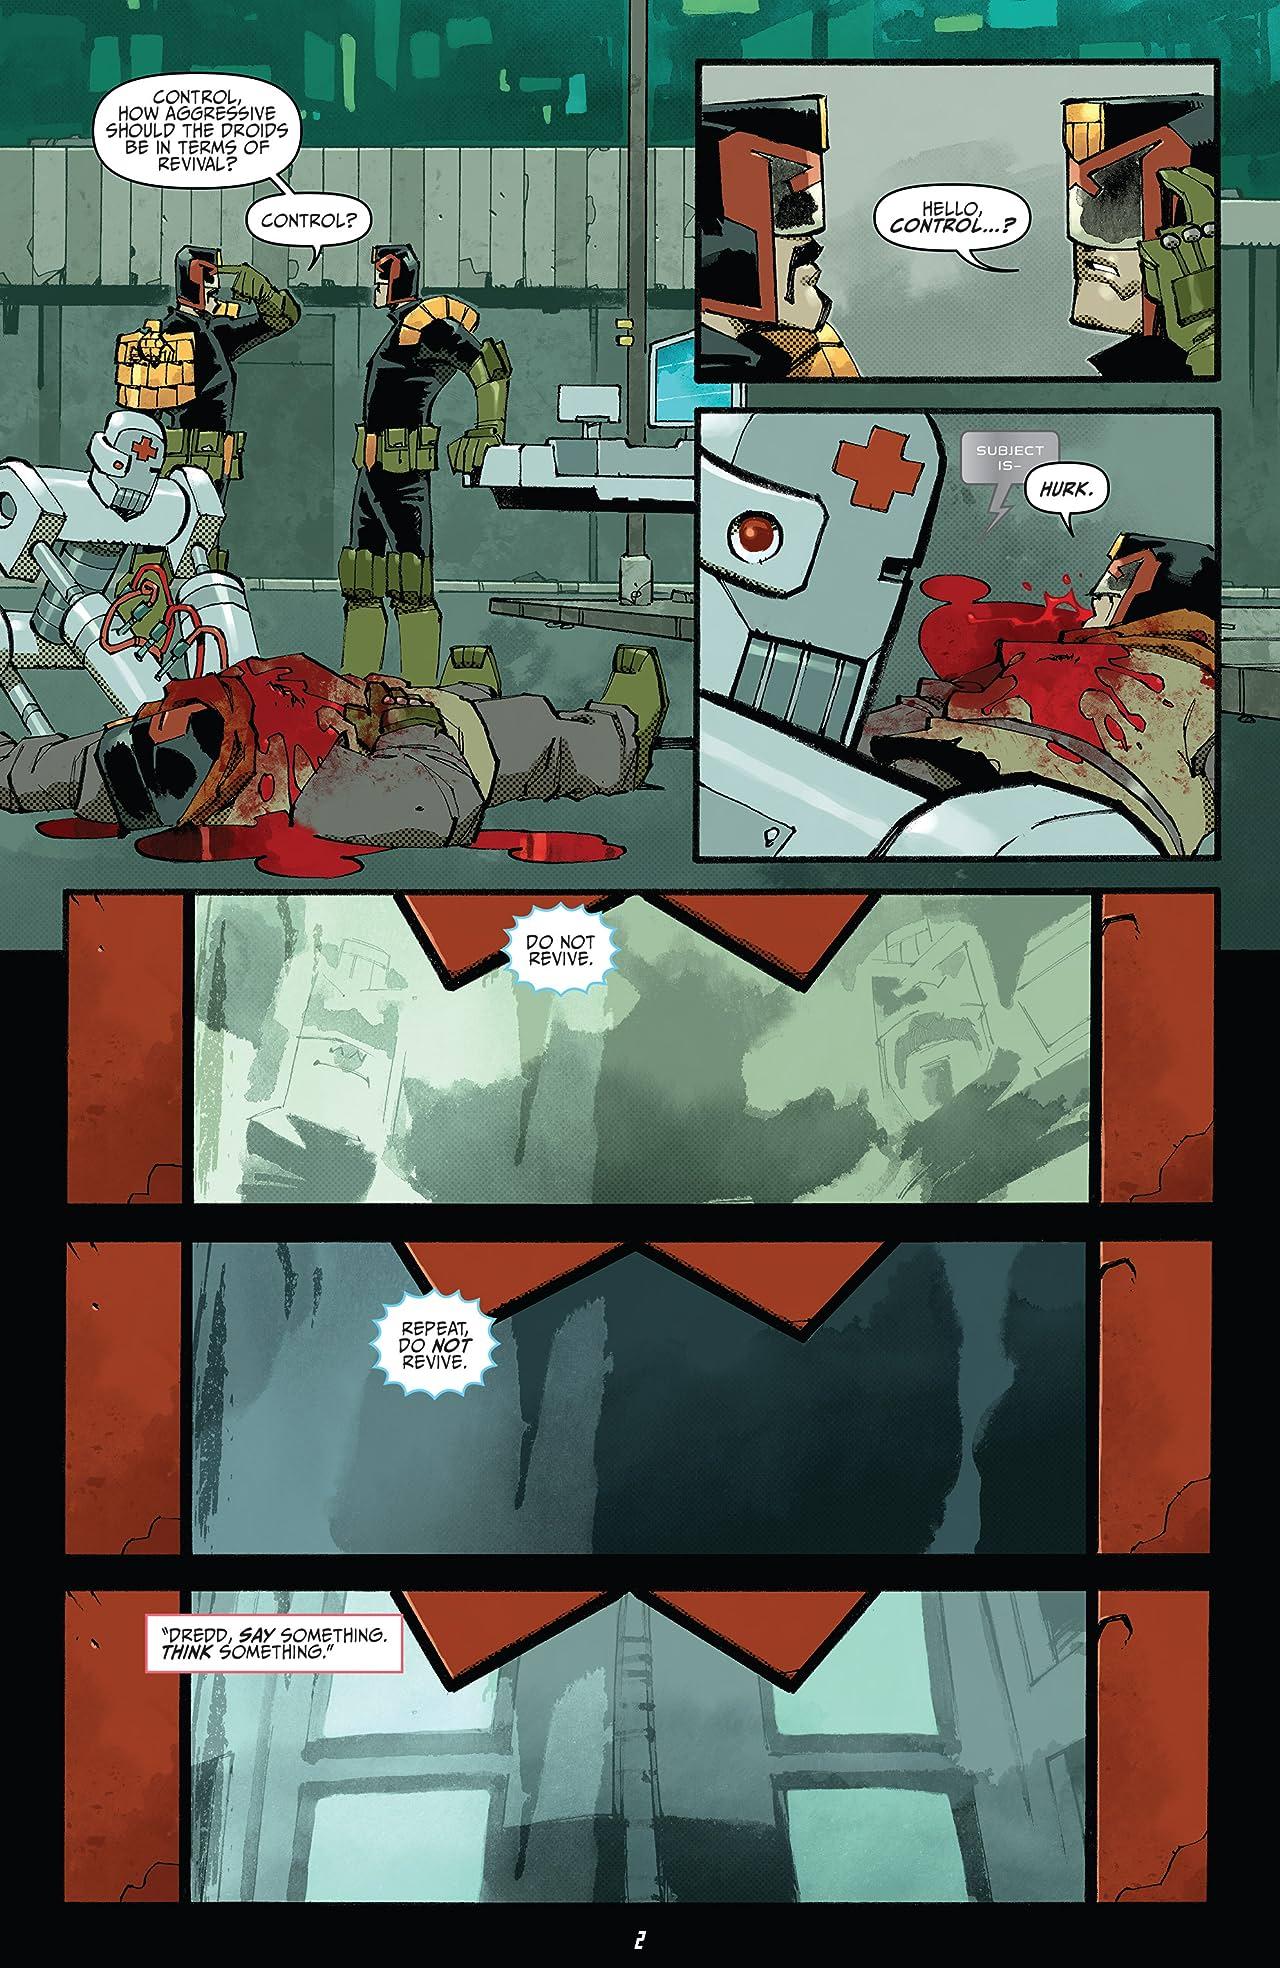 Judge Dredd #28